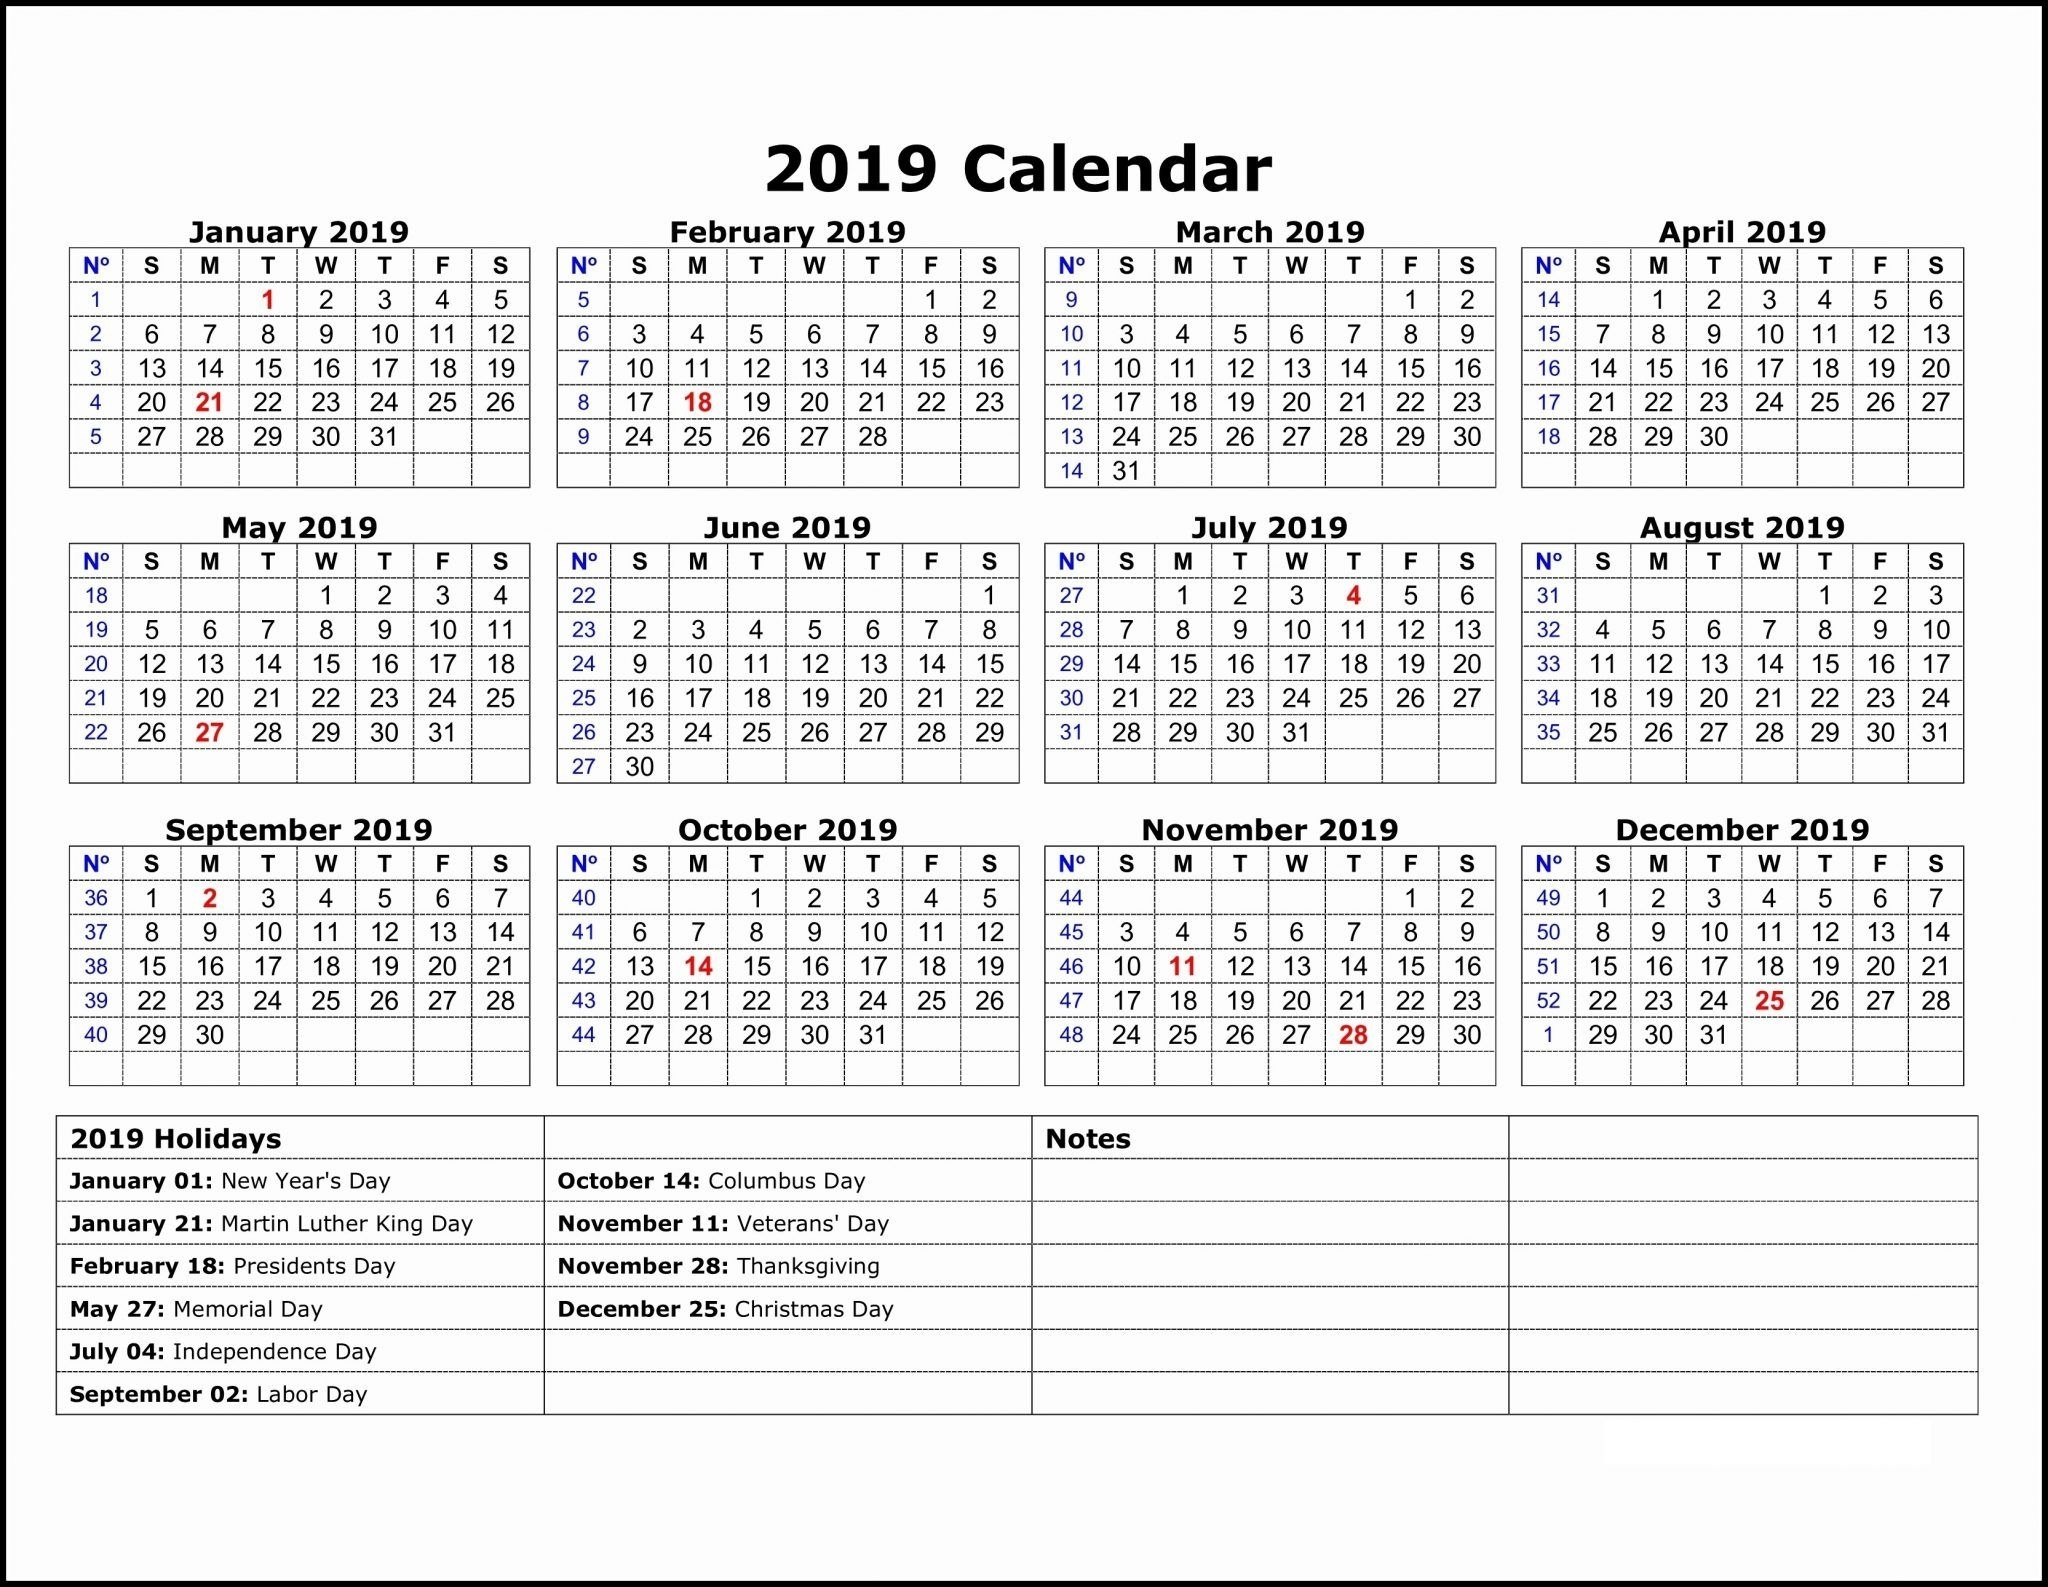 2019 Calendar Template One Page   Printable Calendar